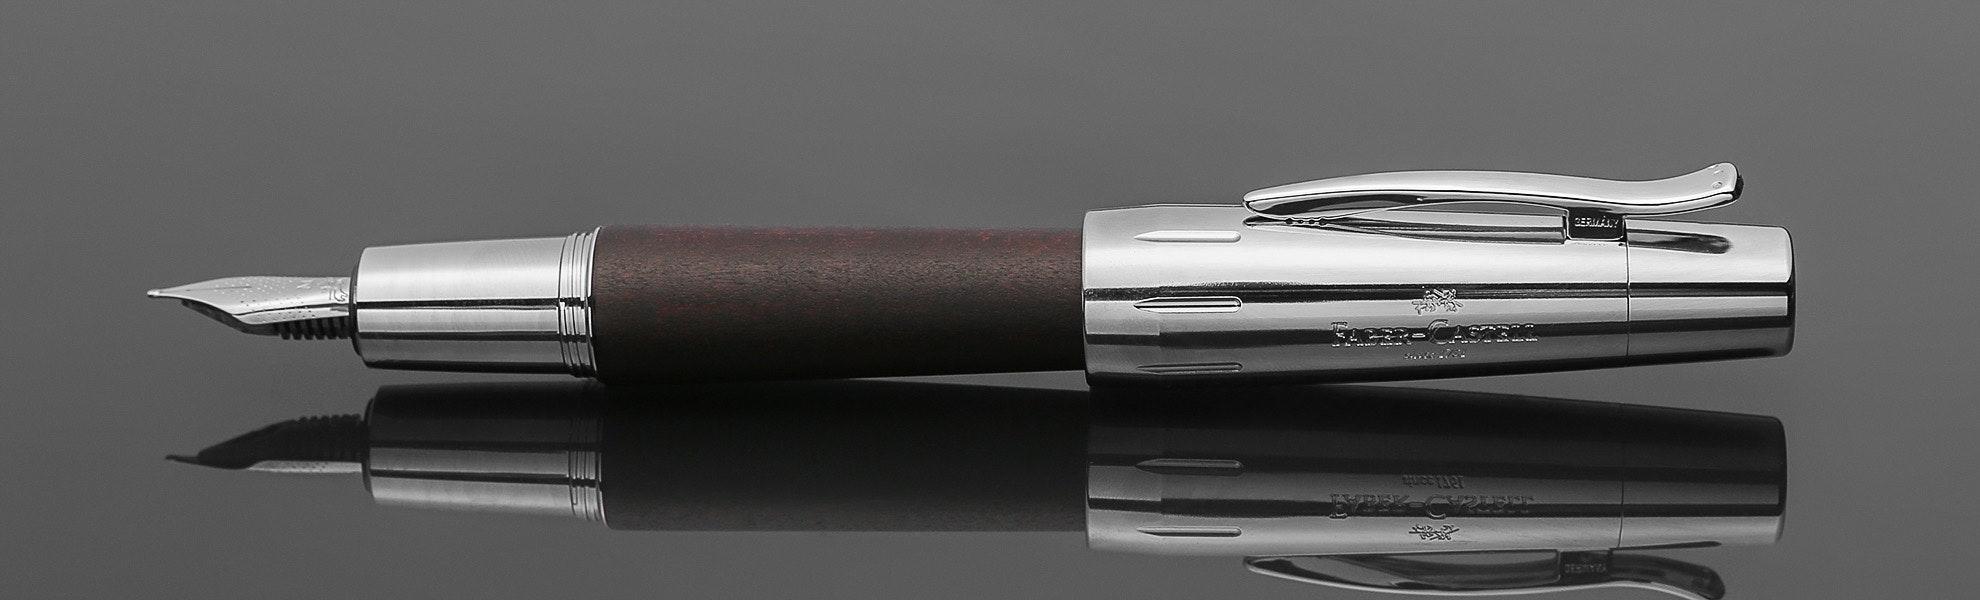 Faber-Castell E-Motion Fountain Pen